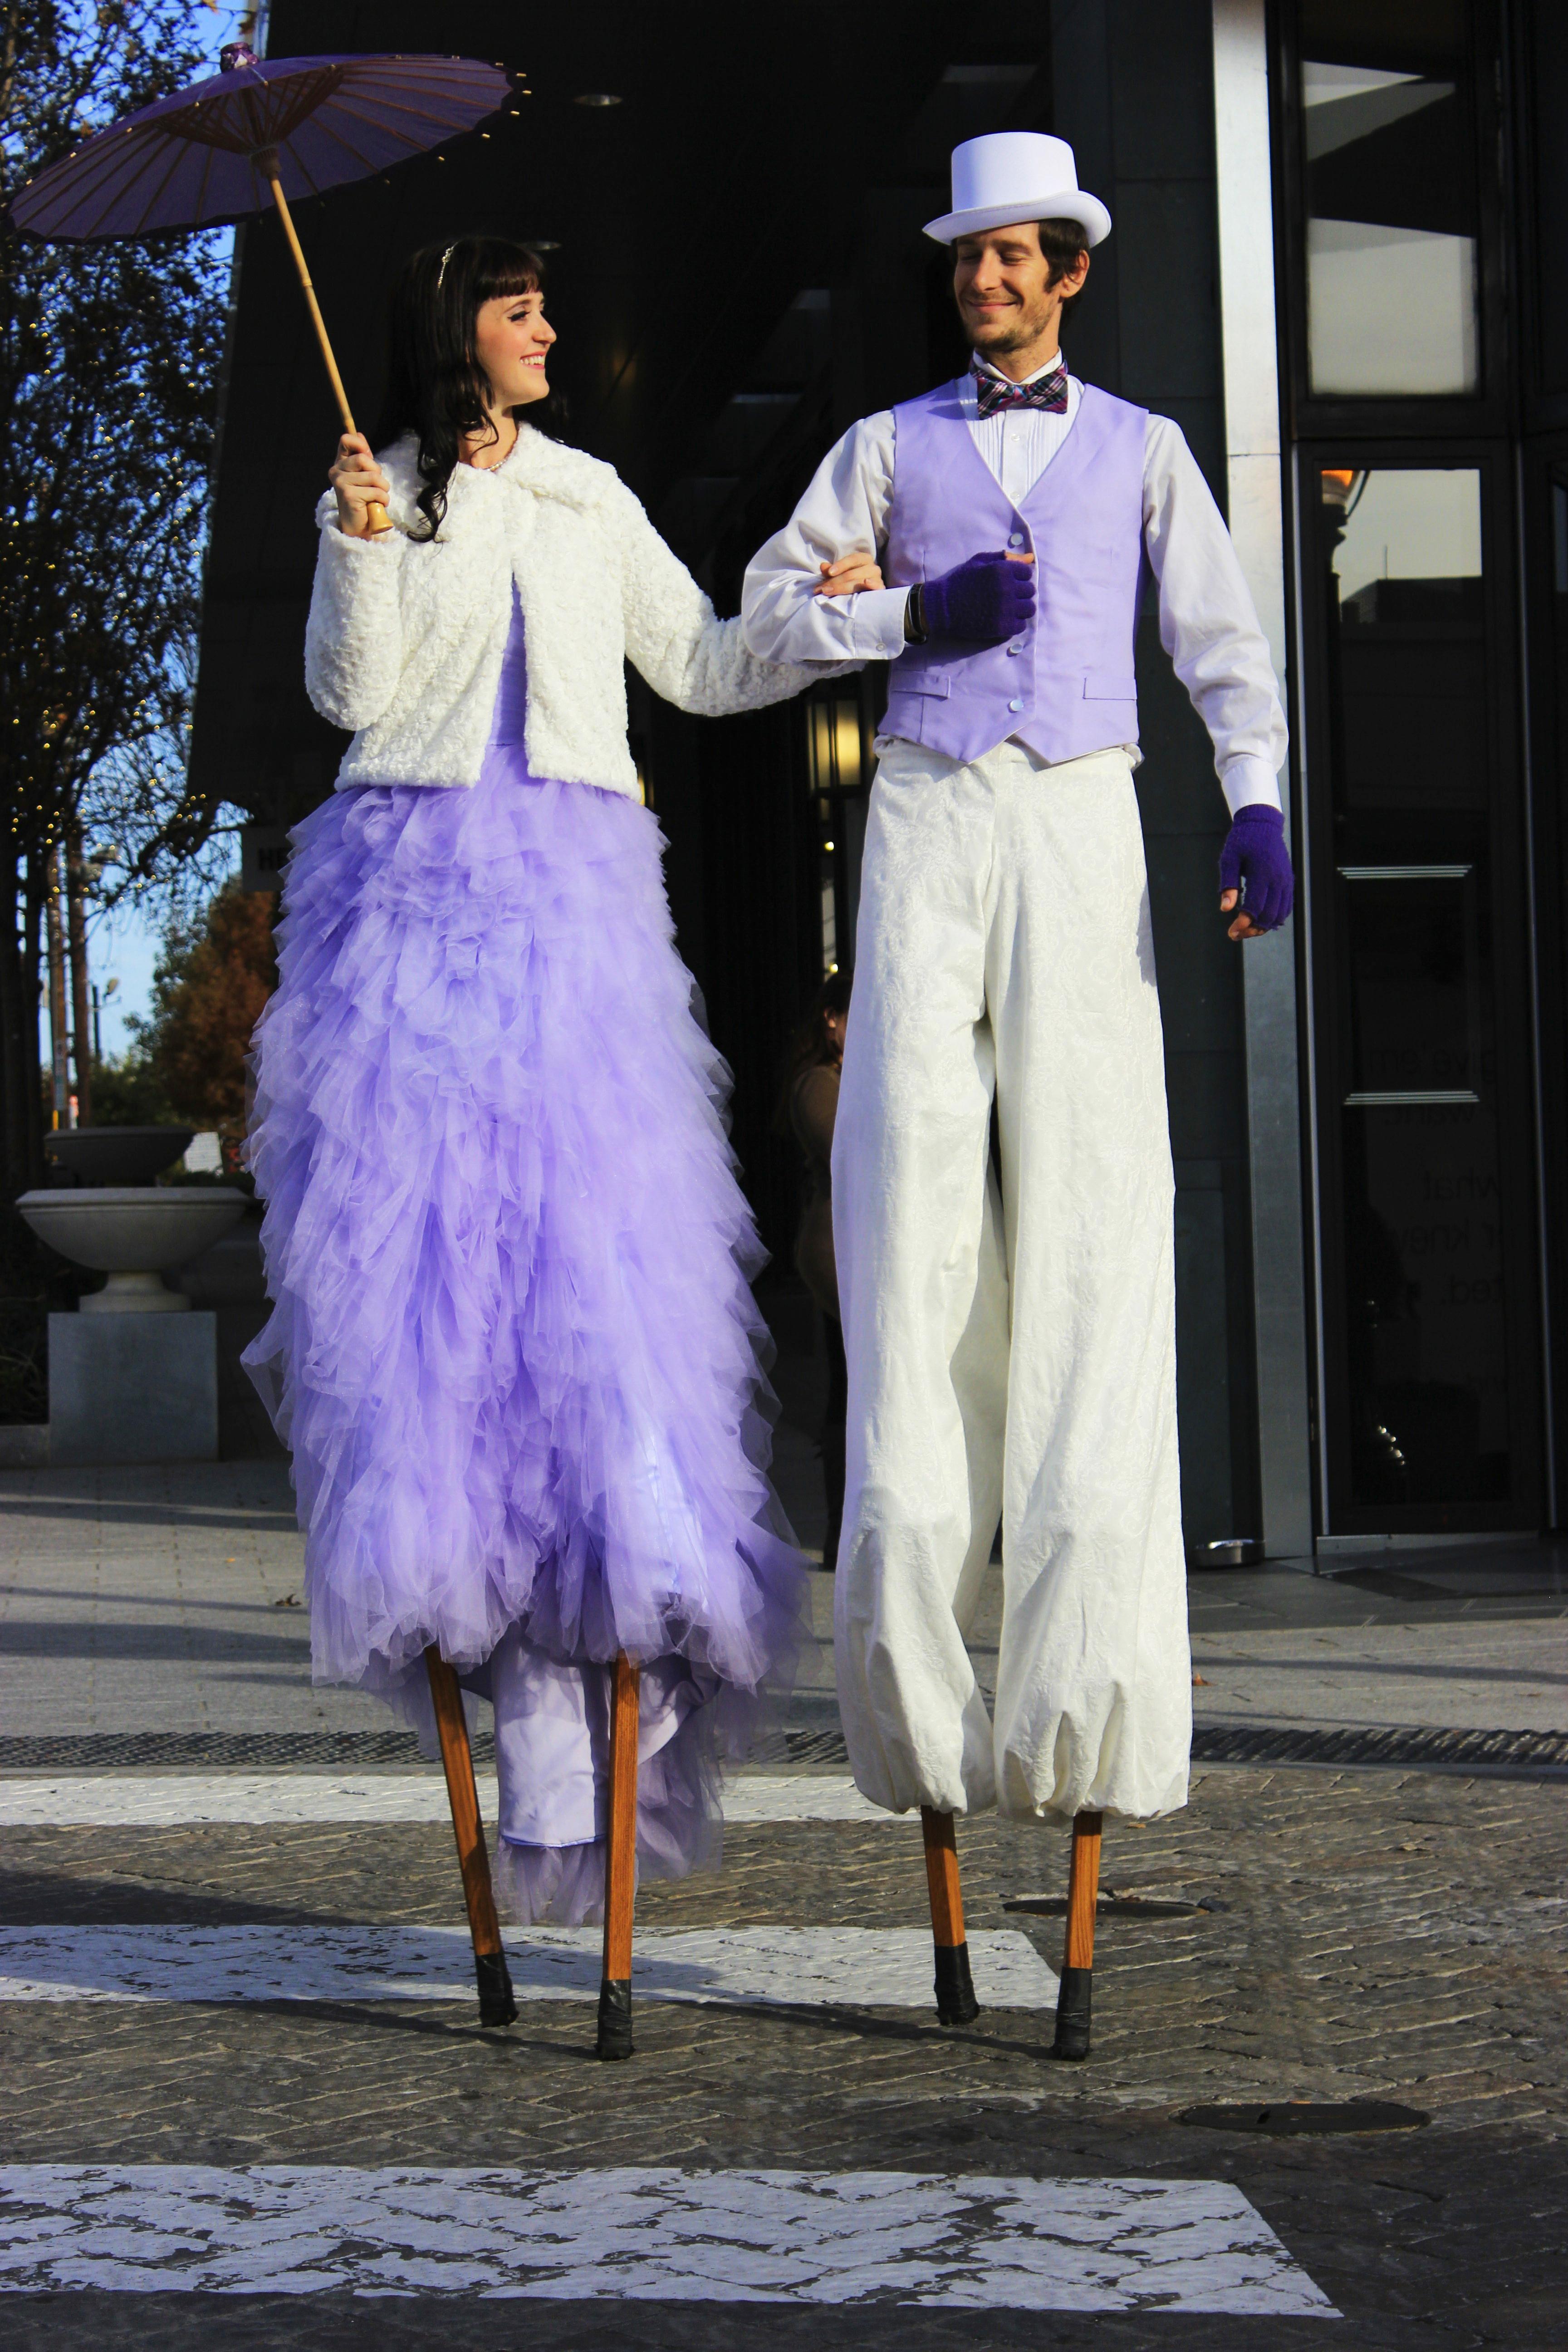 Stilt Walking Couple